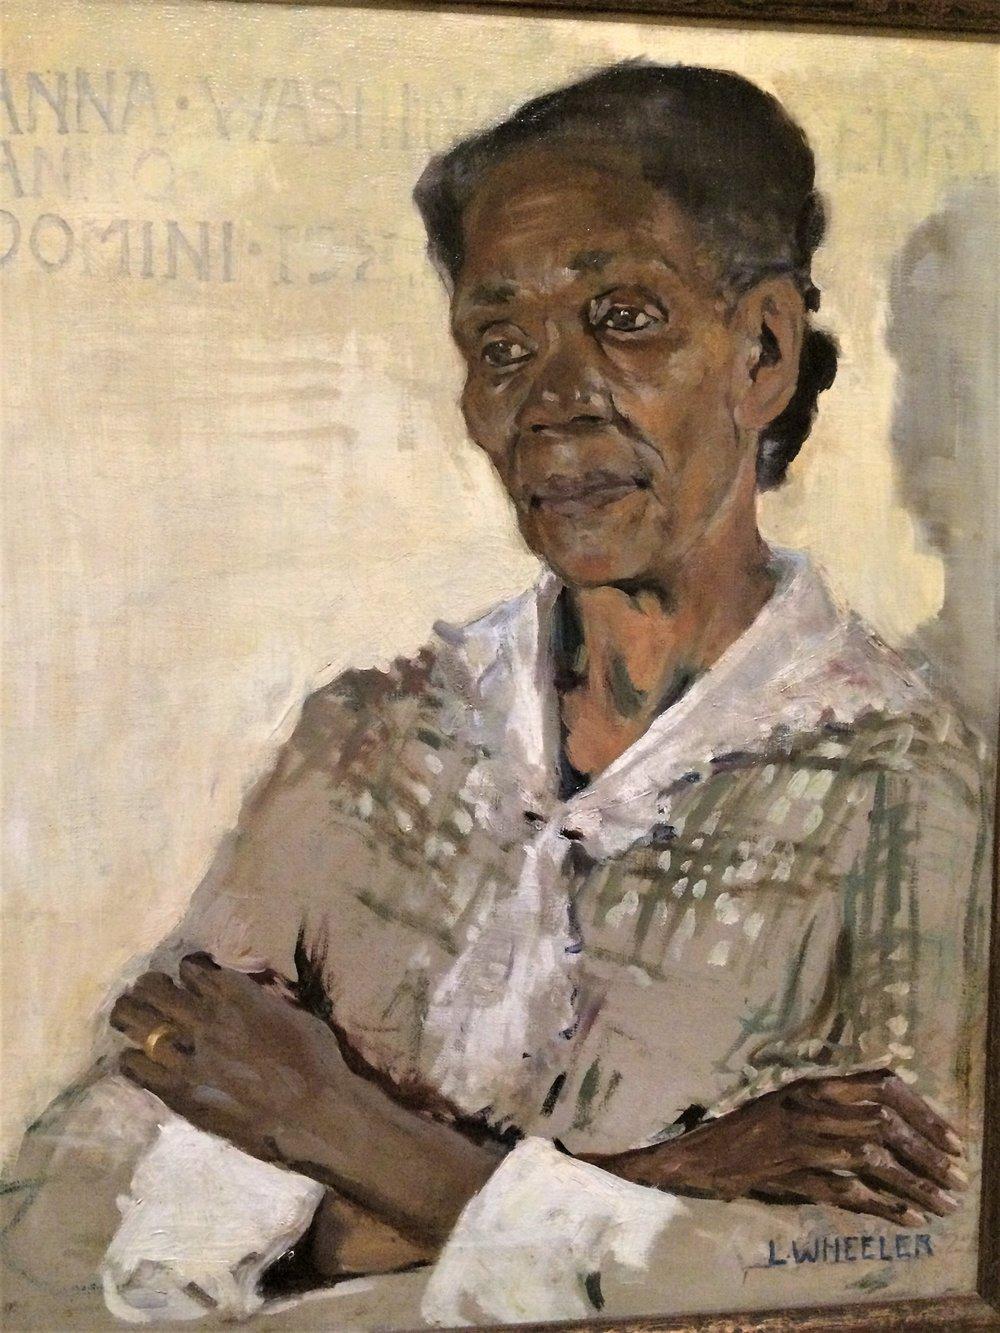 Waring: Anna Washington Derry 1927